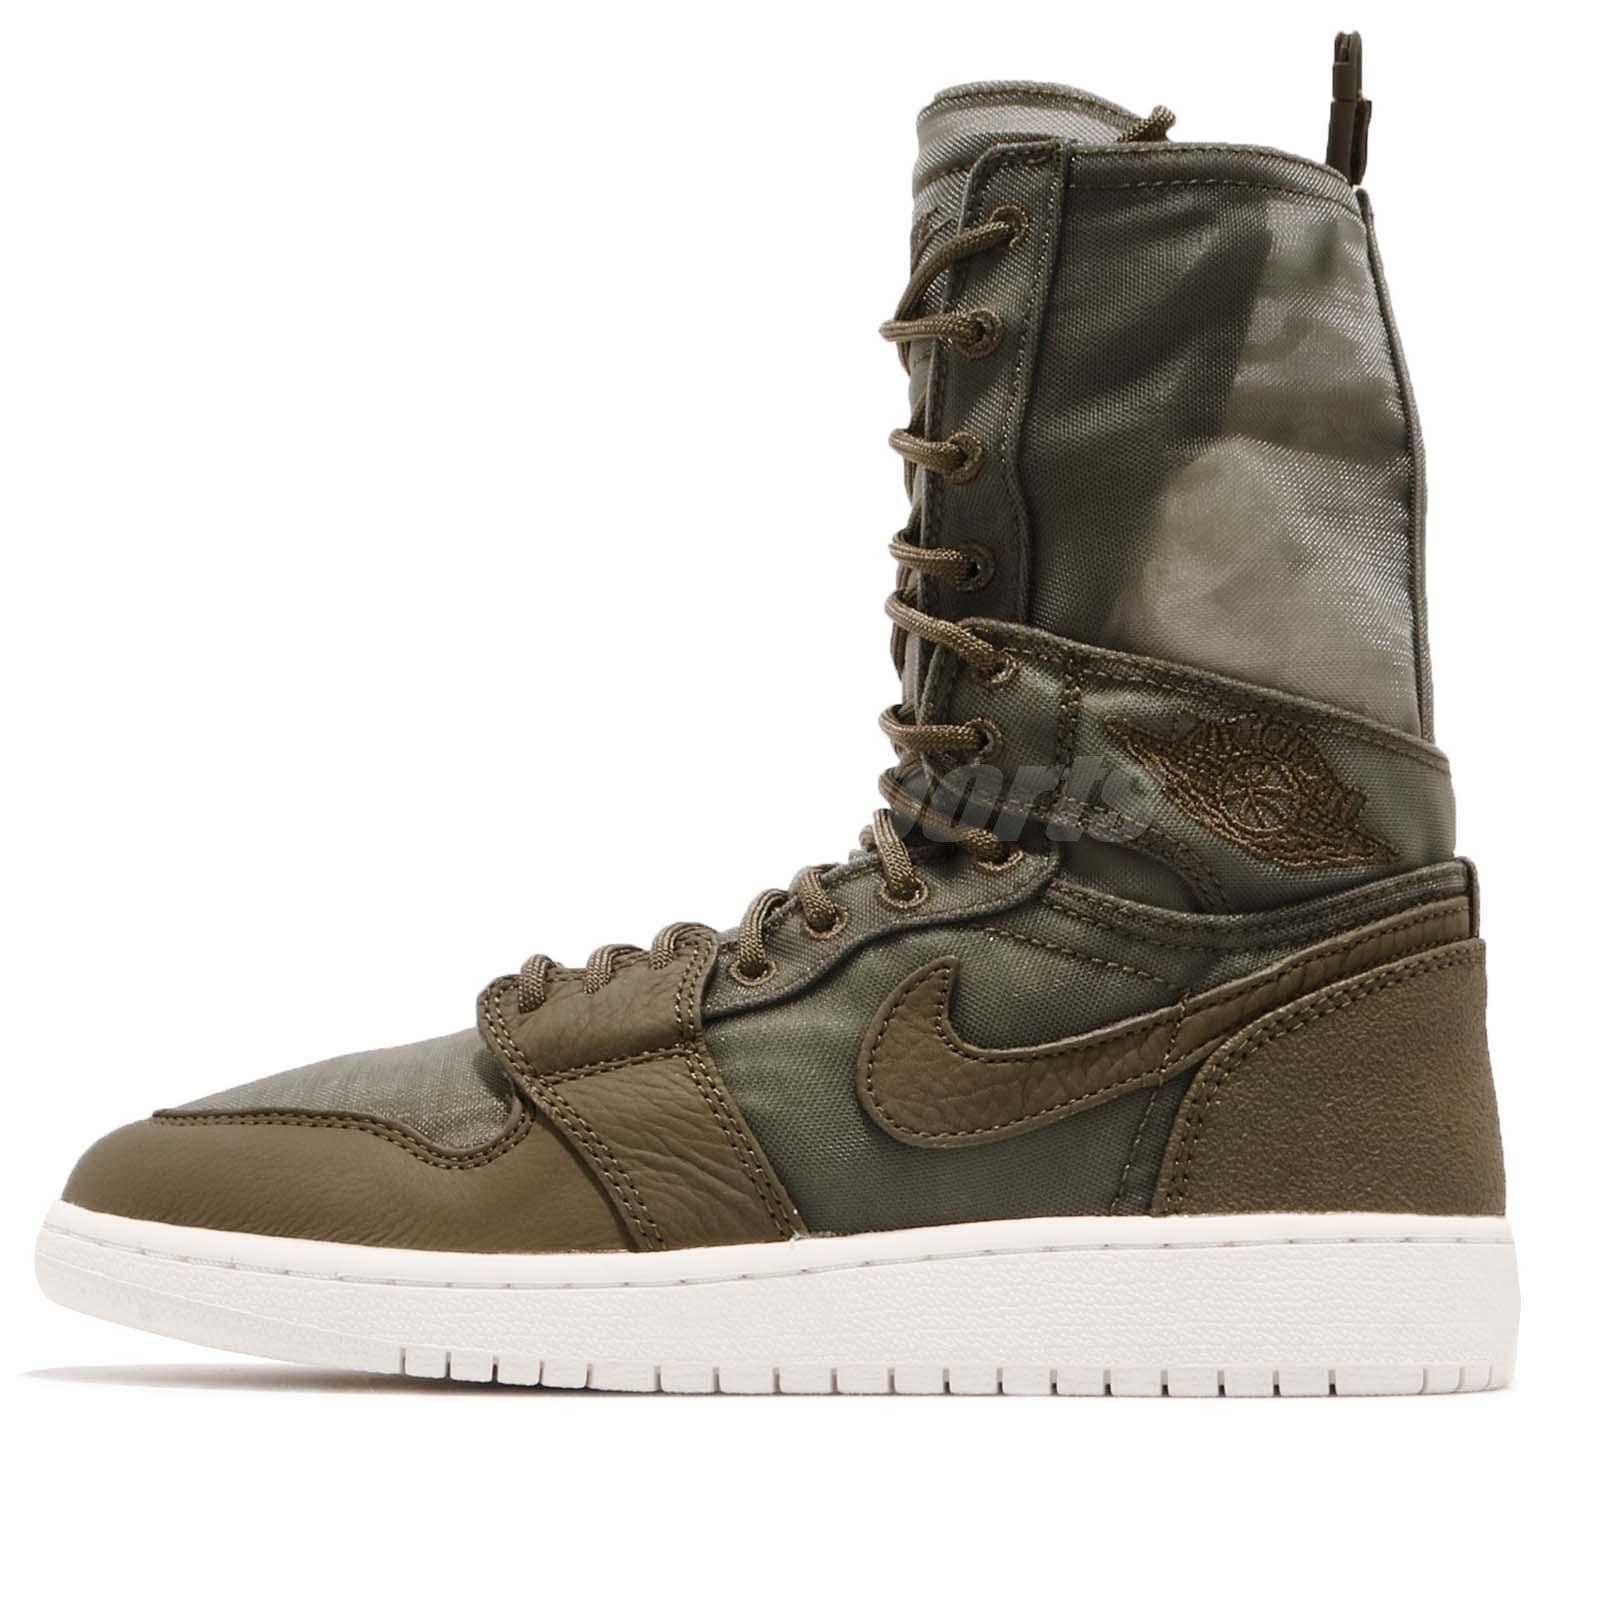 jordan boots for females